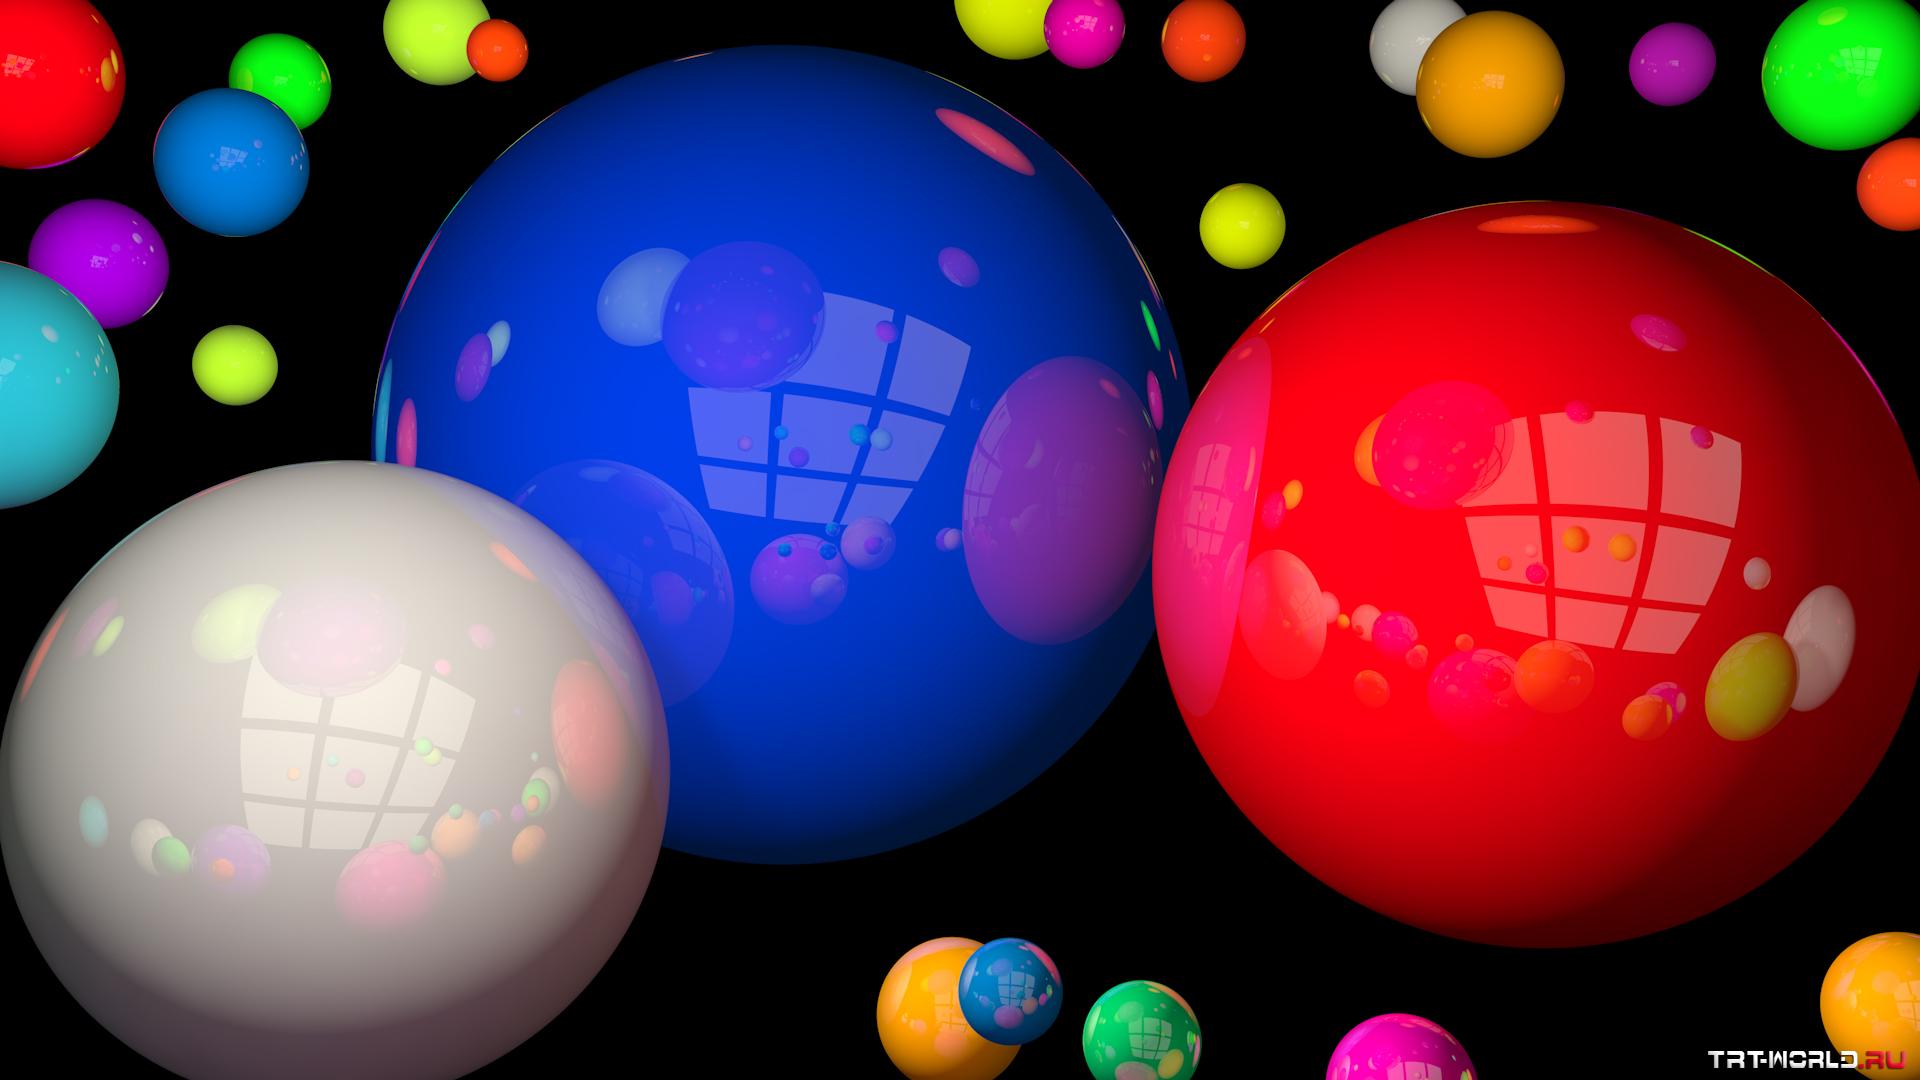 Картинка шары на рабочий стол